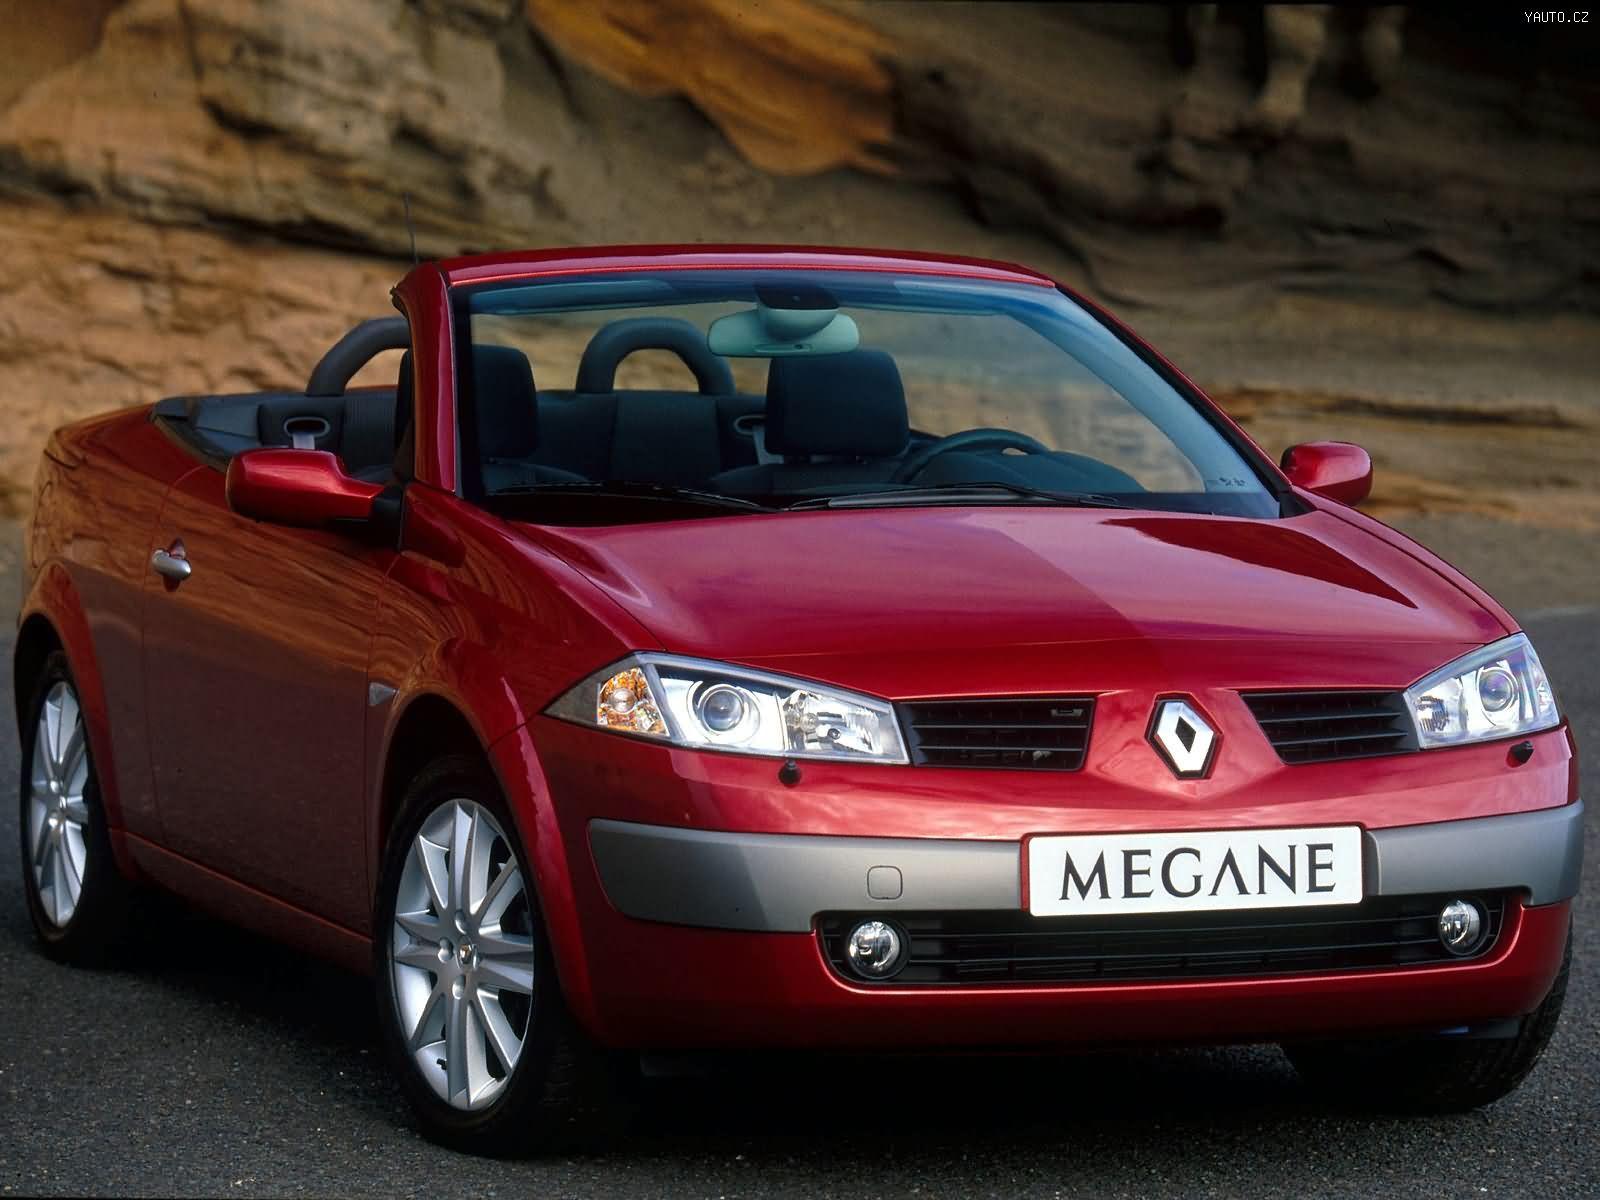 Renault Megane Sedan 2002 >> Renault Mégane II Coupé (2003) Auta na plochu, tapety na plochu, wallpapers